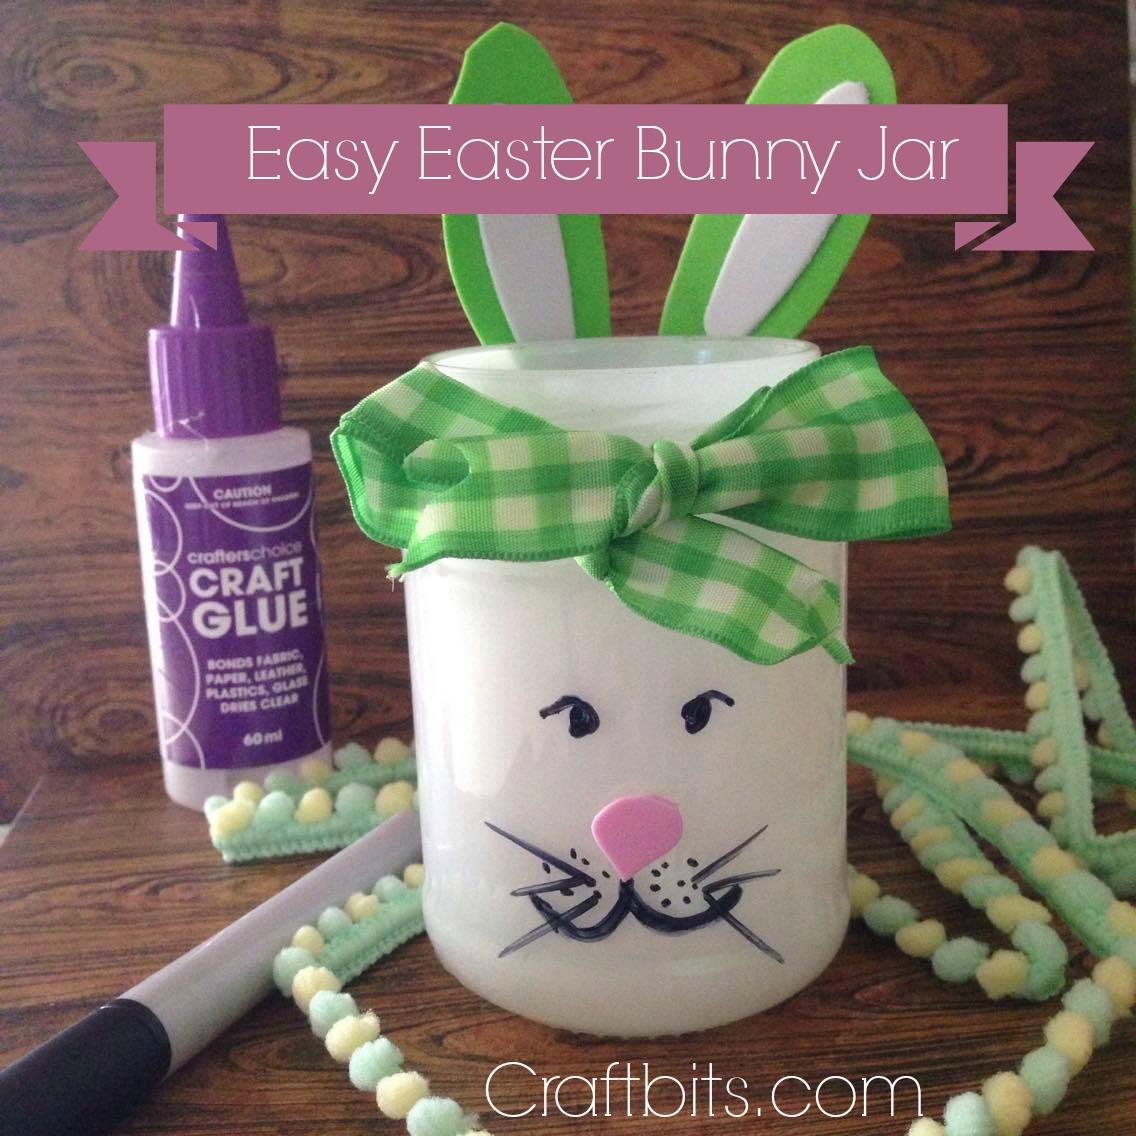 The Mason Jar Easter Bunny